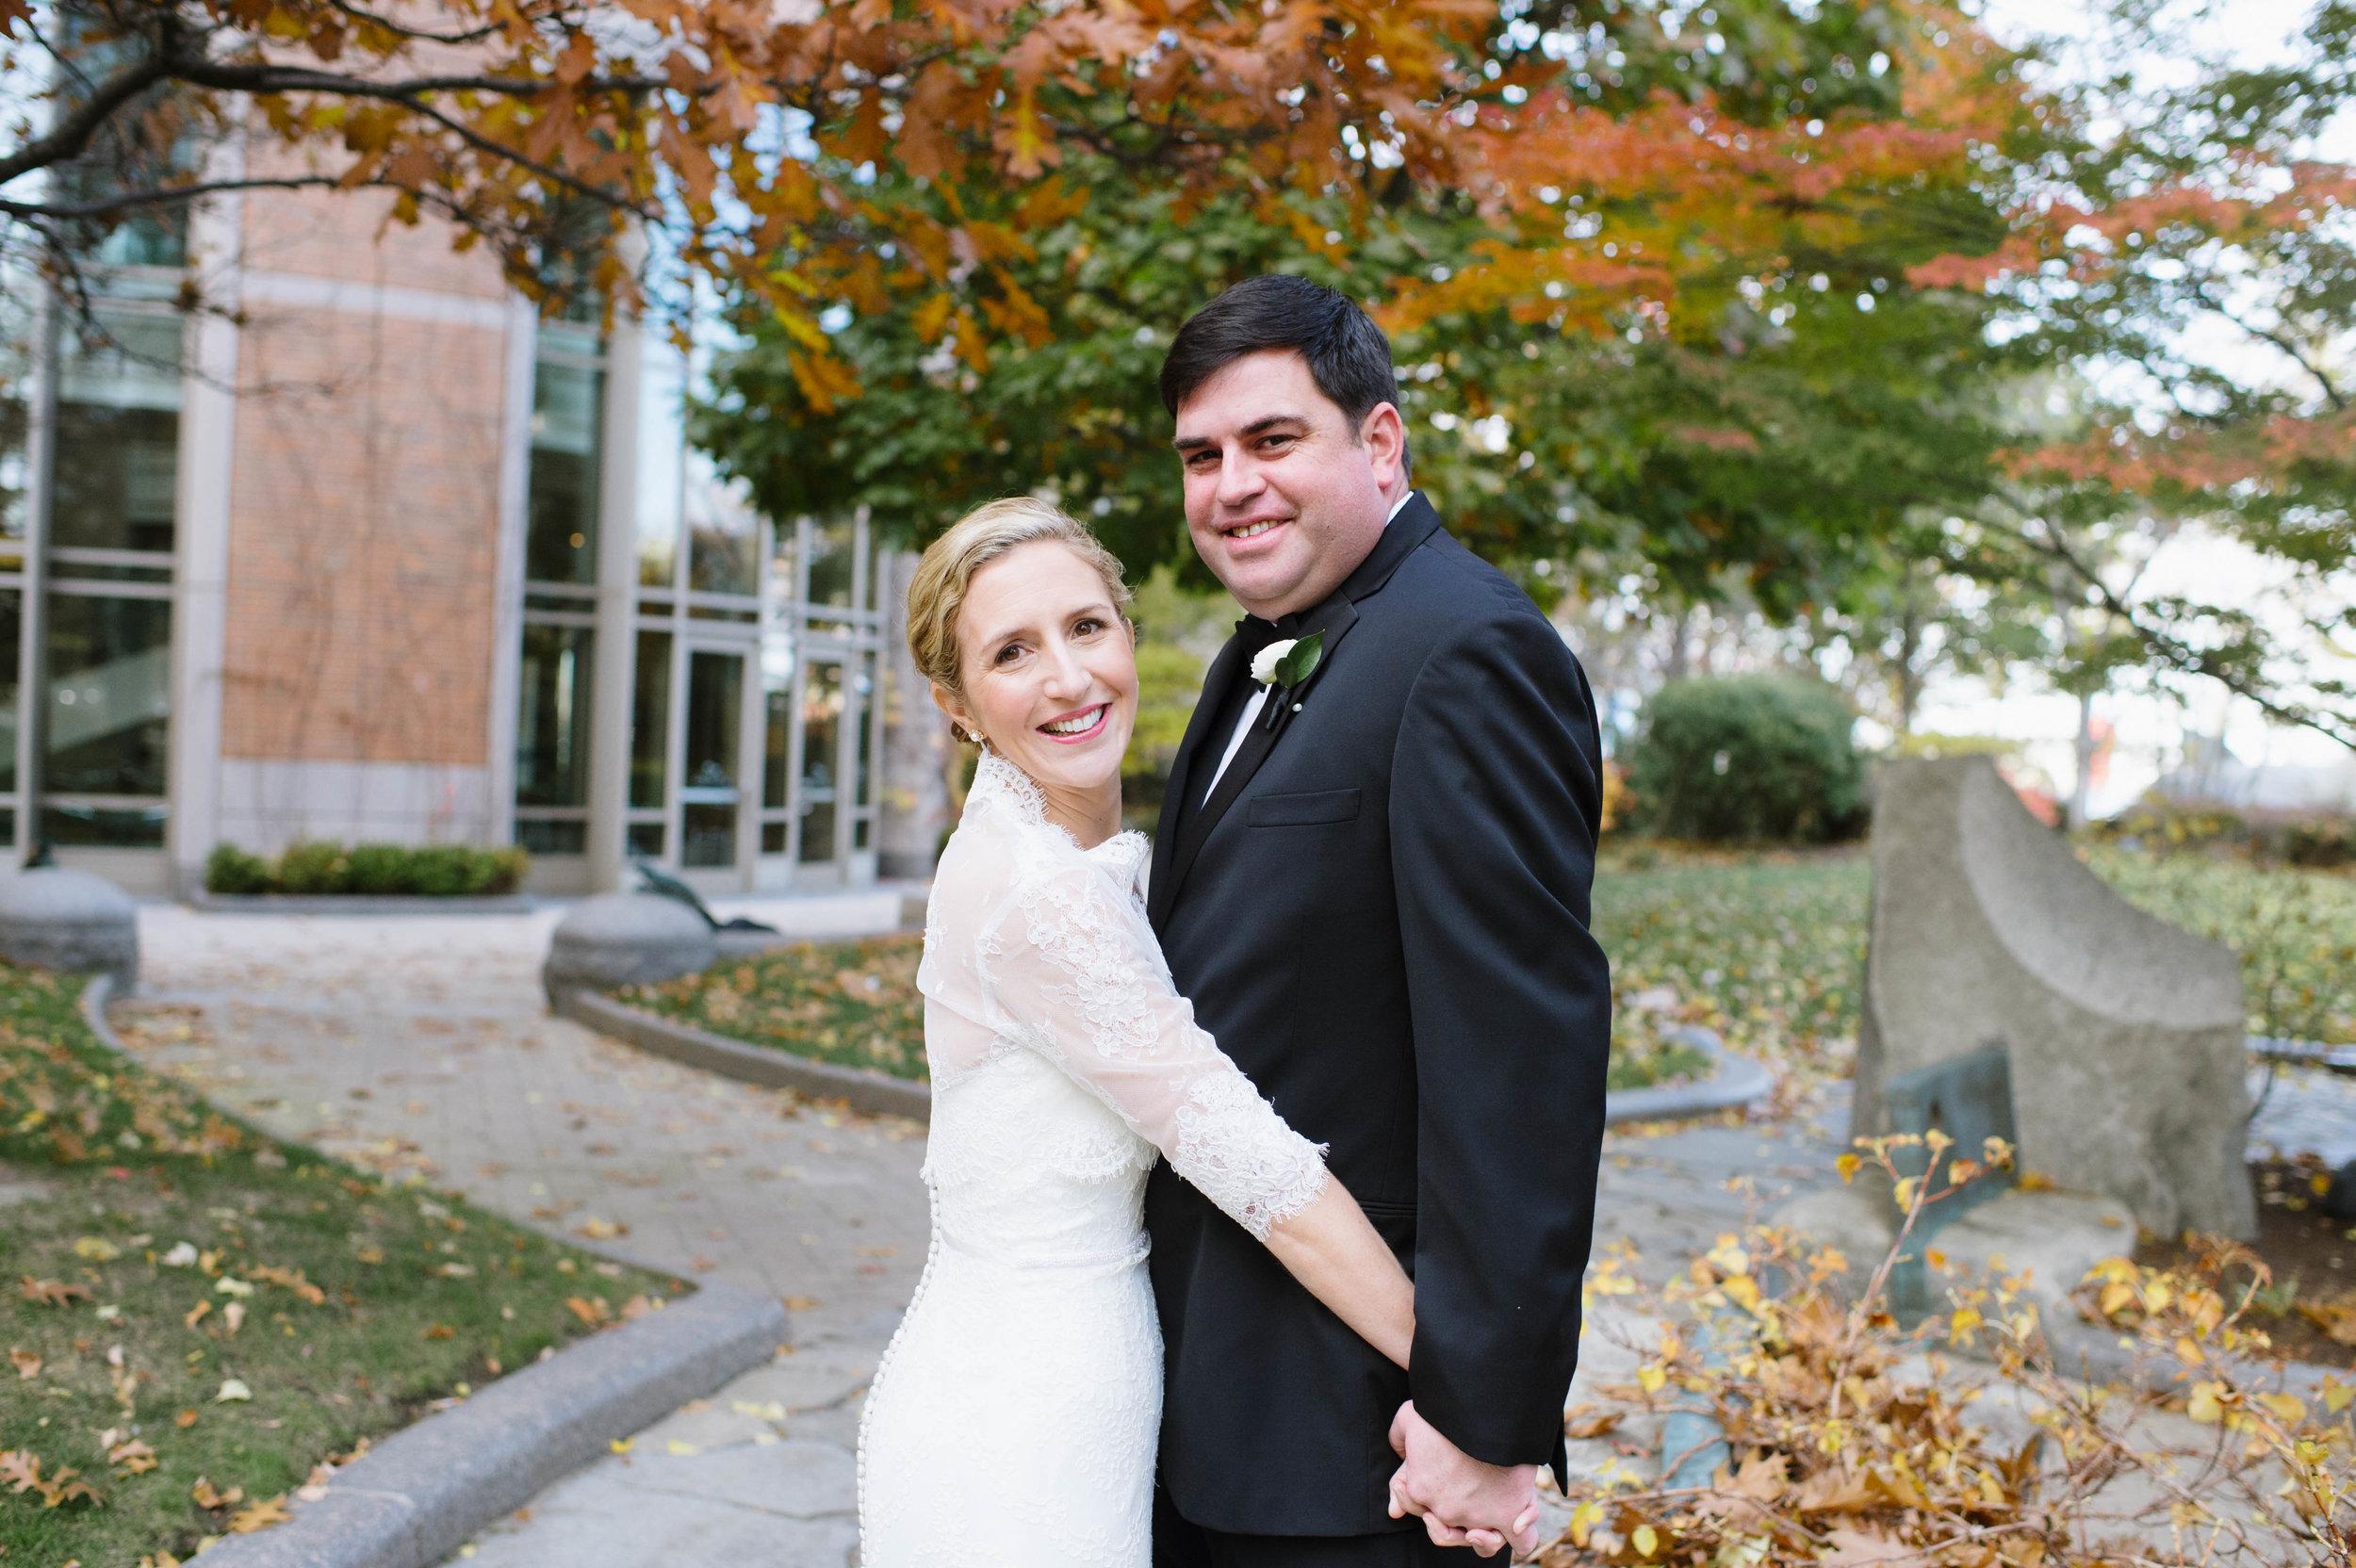 Creative-Wedding-Photography-Boston21.jpg